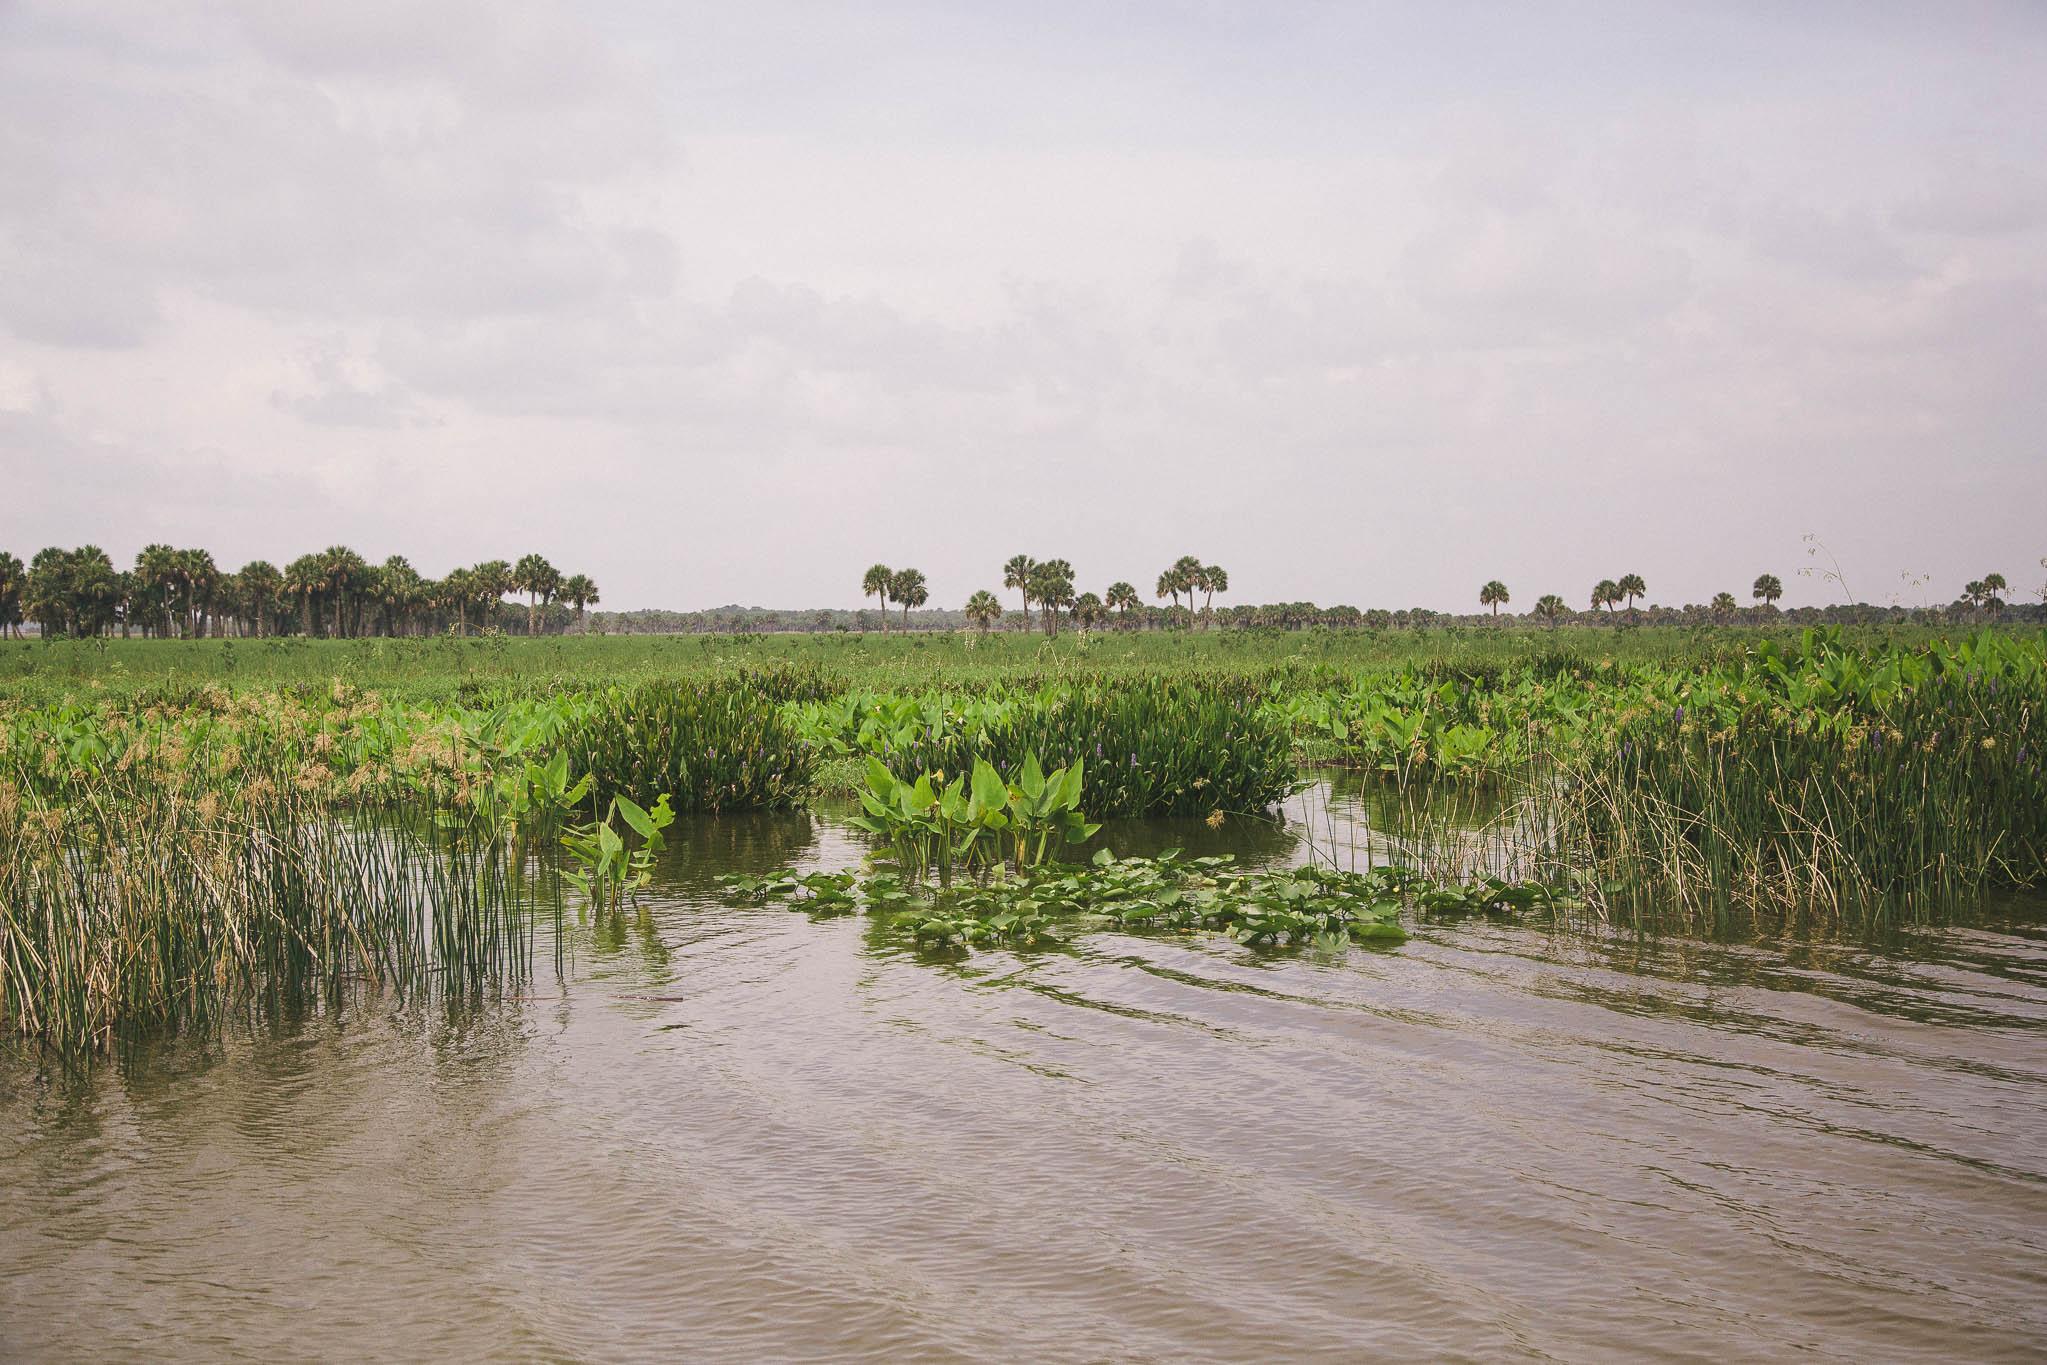 Florida-Lorraine-Yeung-21-1.jpg